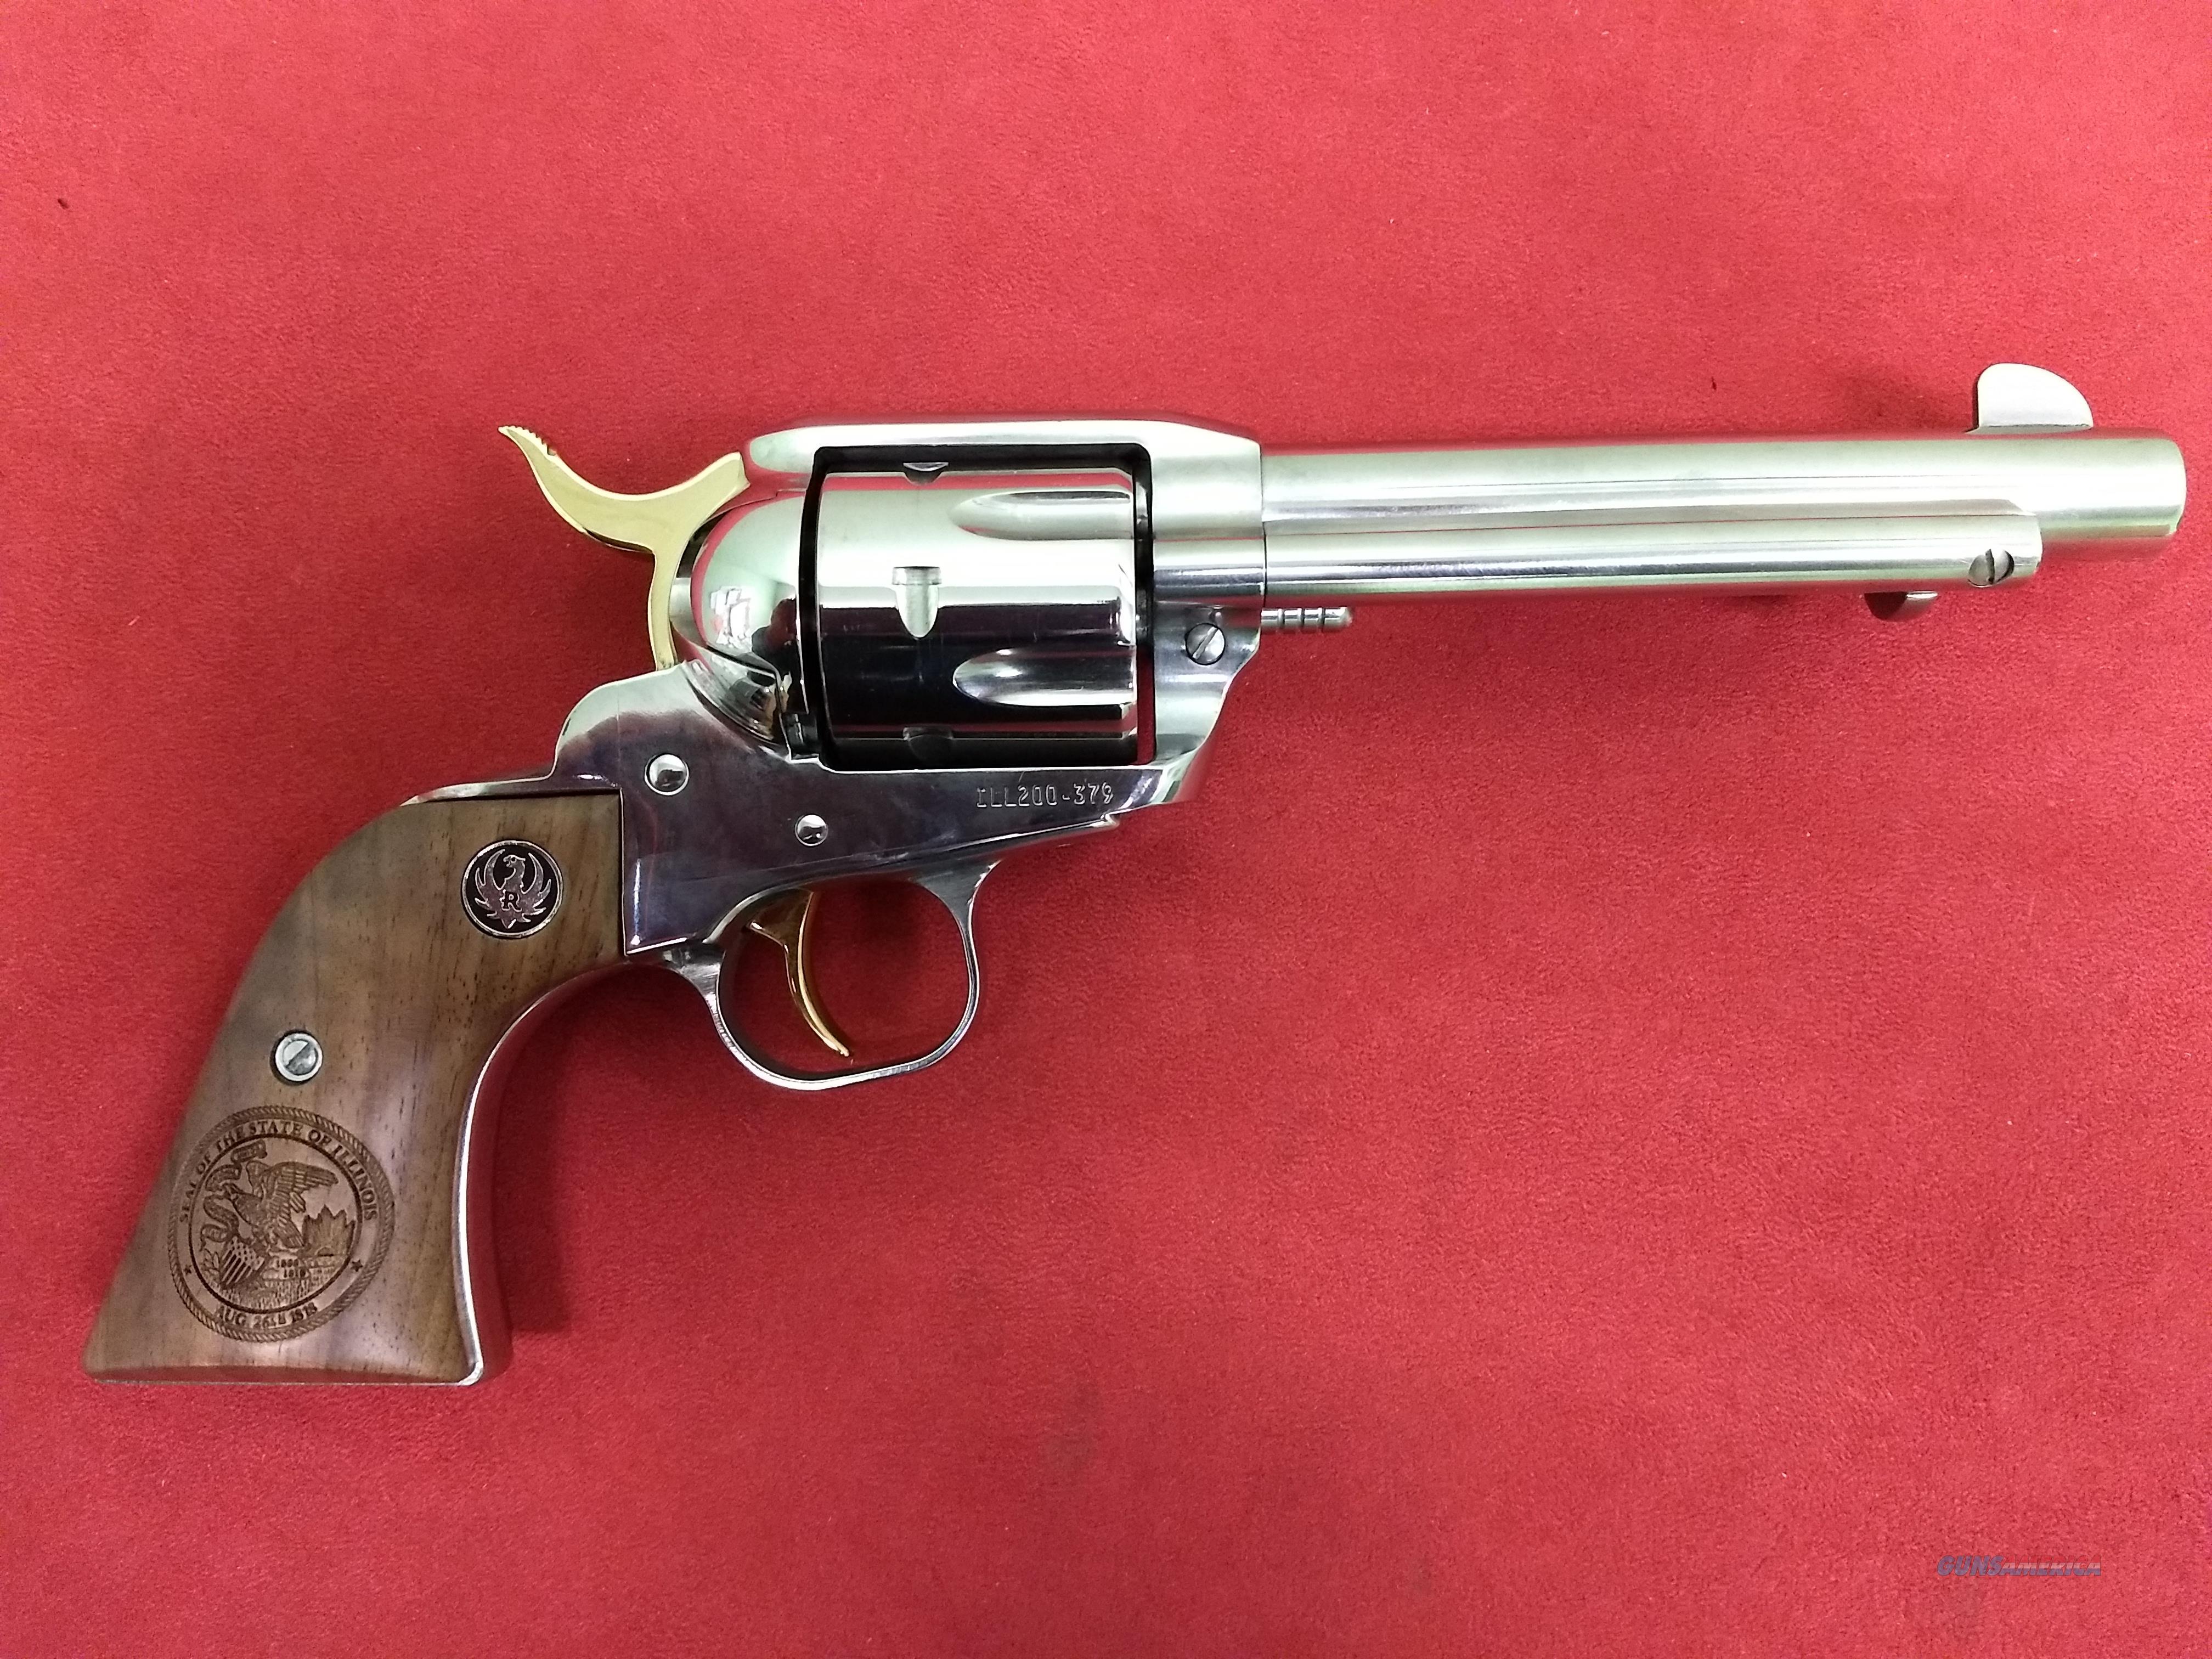 Ruger Illinois Bicentennial Limited Edition New Vaquero, 45 Colt, NIB  Guns > Pistols > Kimber of America Pistols